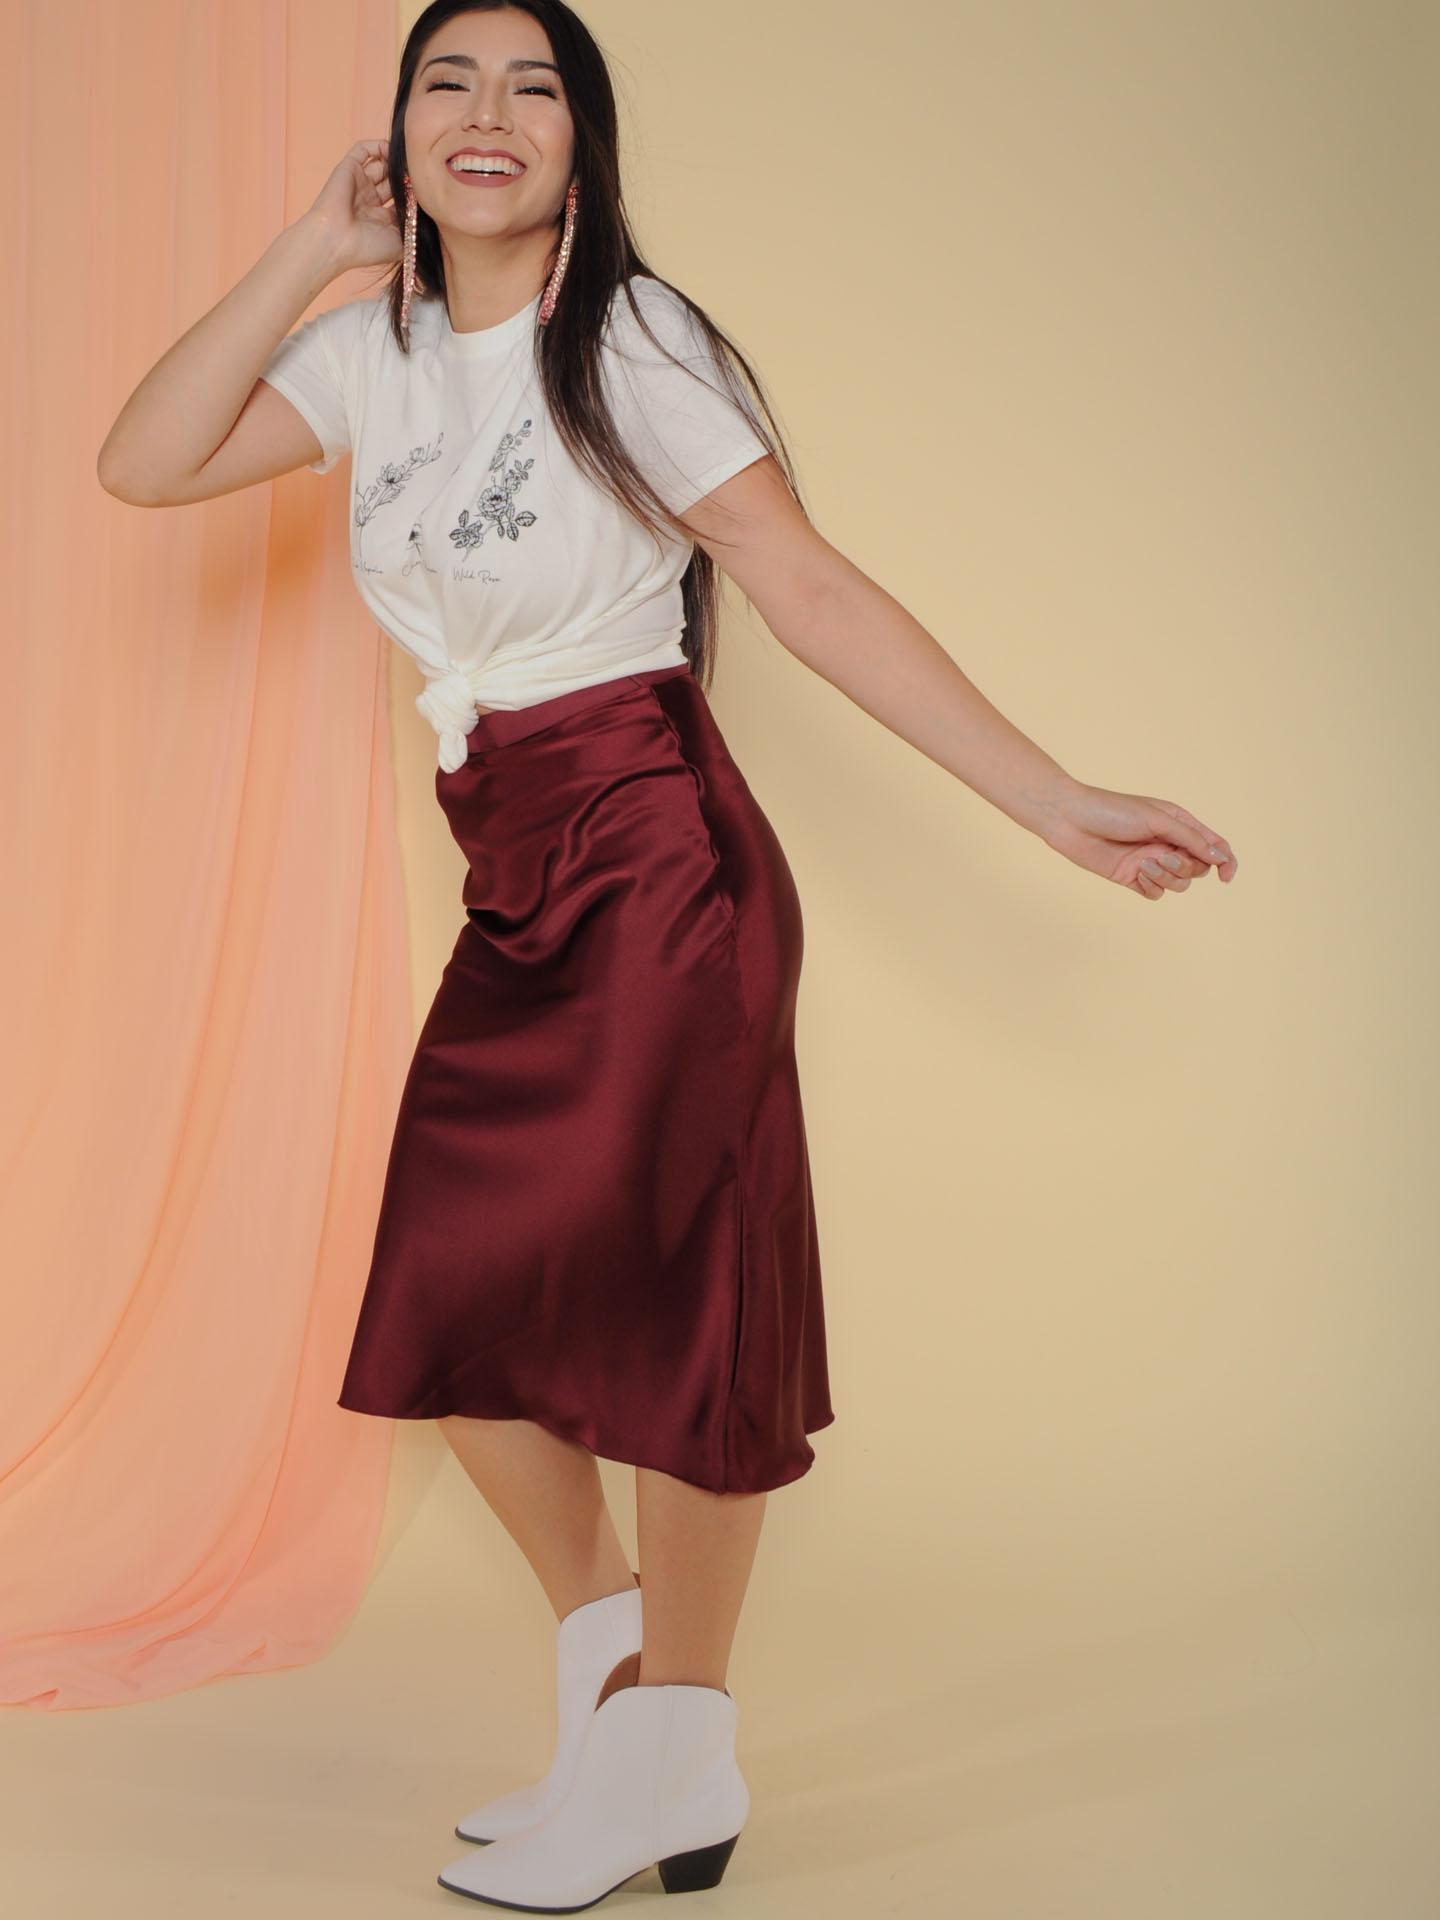 Superior Skirt Sleek and Satin Midi Burgandy Full